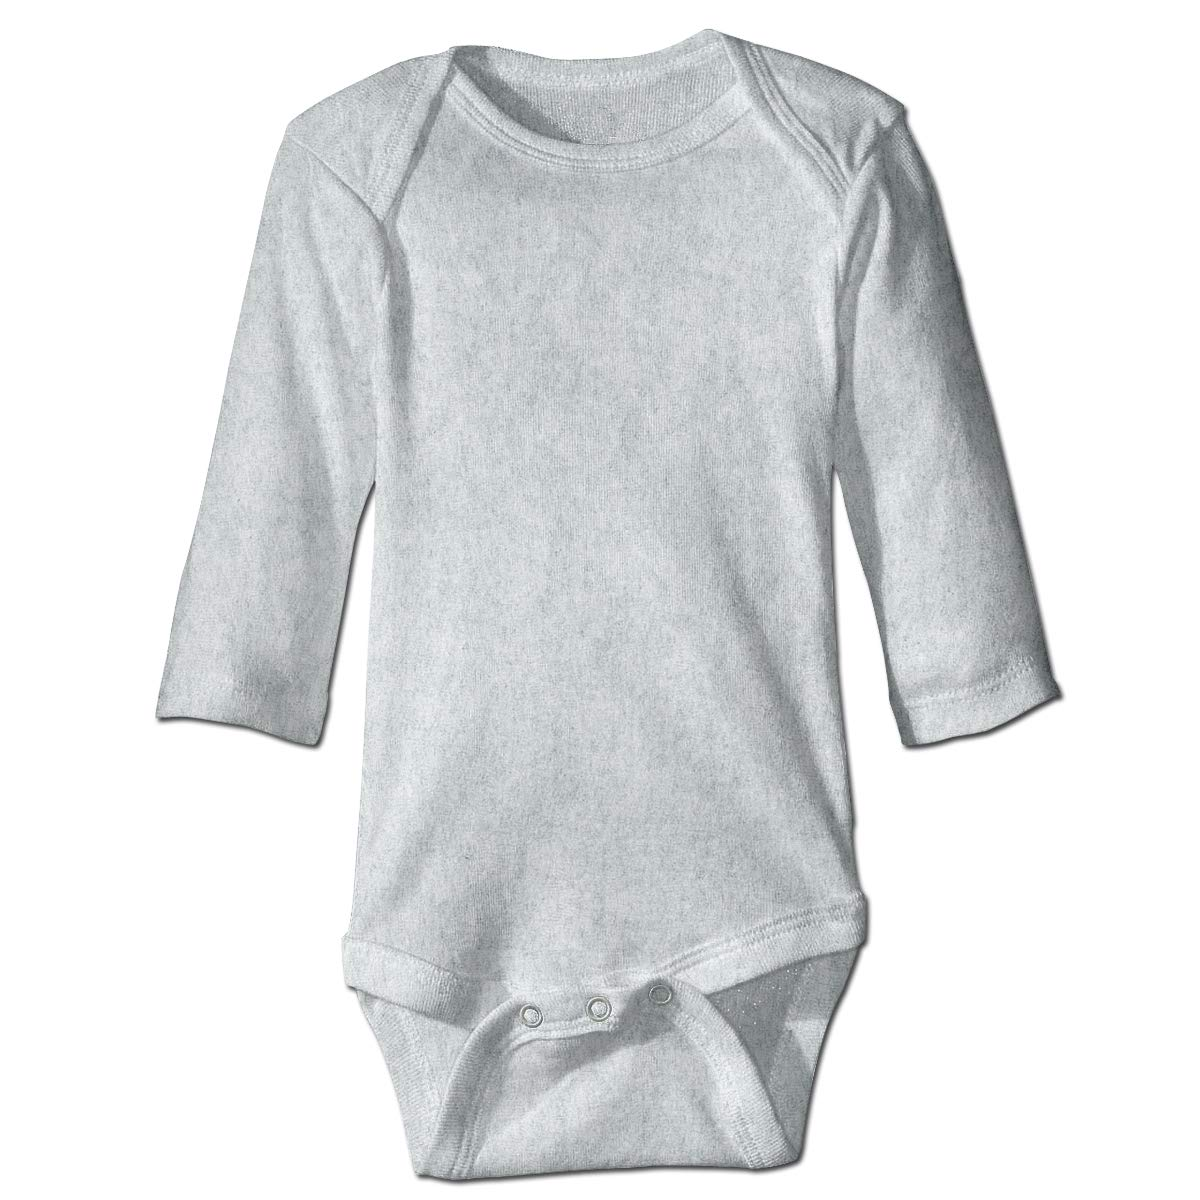 SKYAKLJA Dunder Mifflin Inc Childrens Black Cotton Long Sleeve Round Neck T Shirt for Boy Or Girl